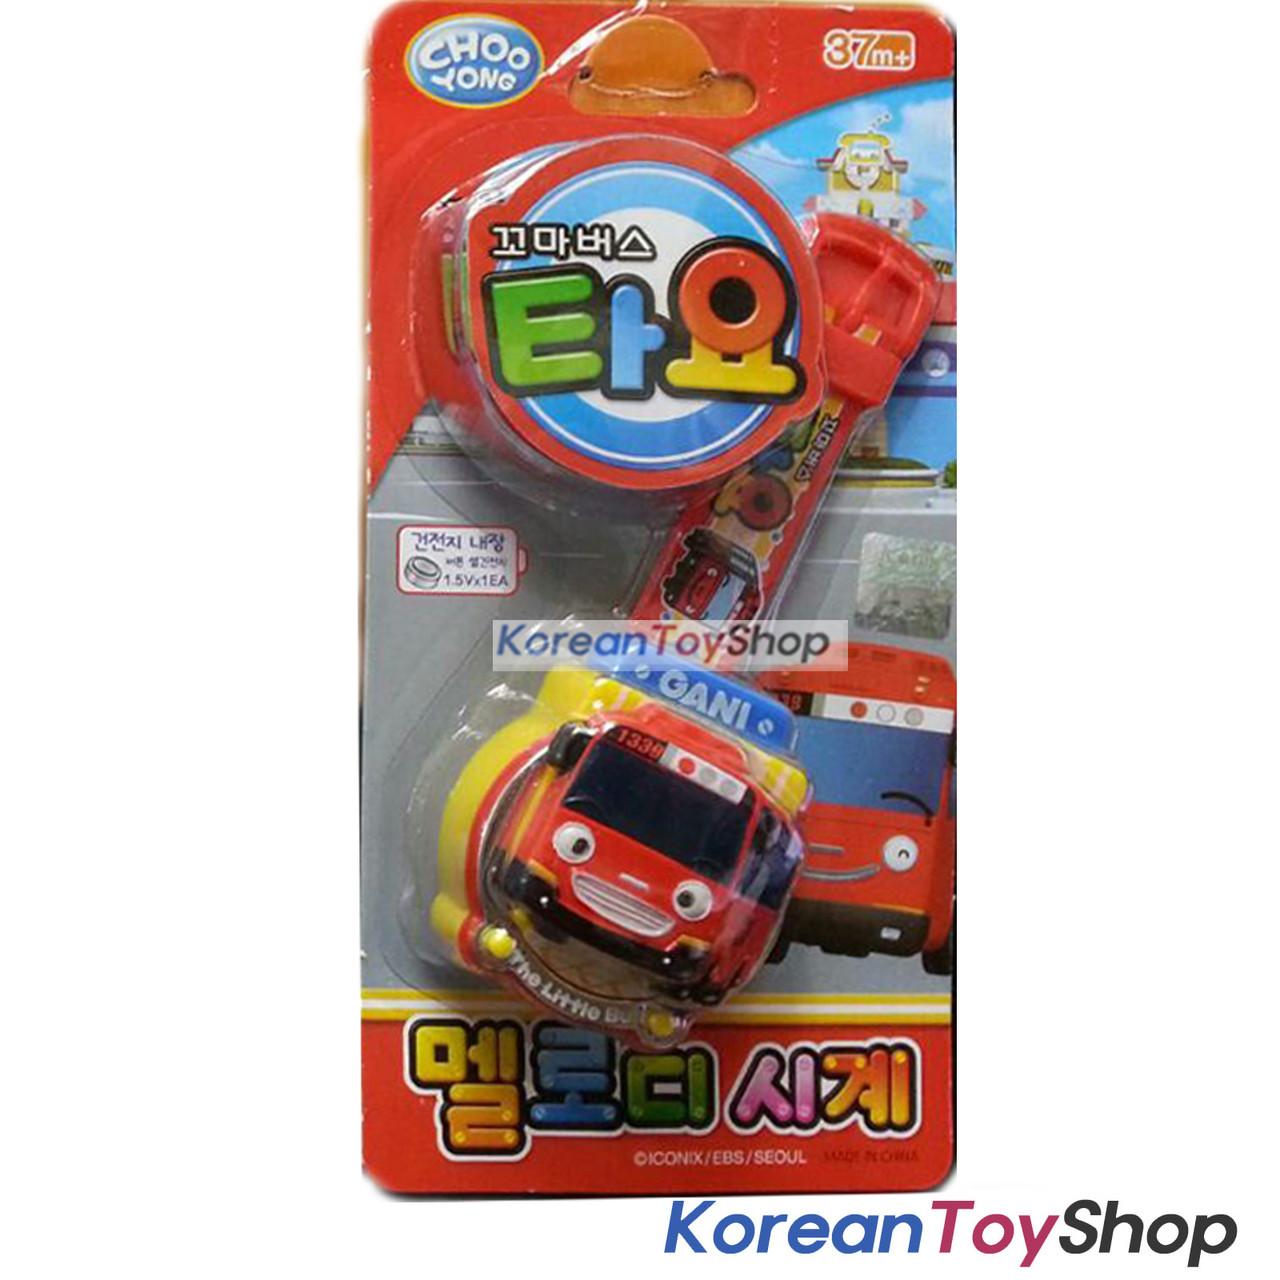 Tayo Melody Watch Red Wrist Band Toy W Figure Kids Children Korean